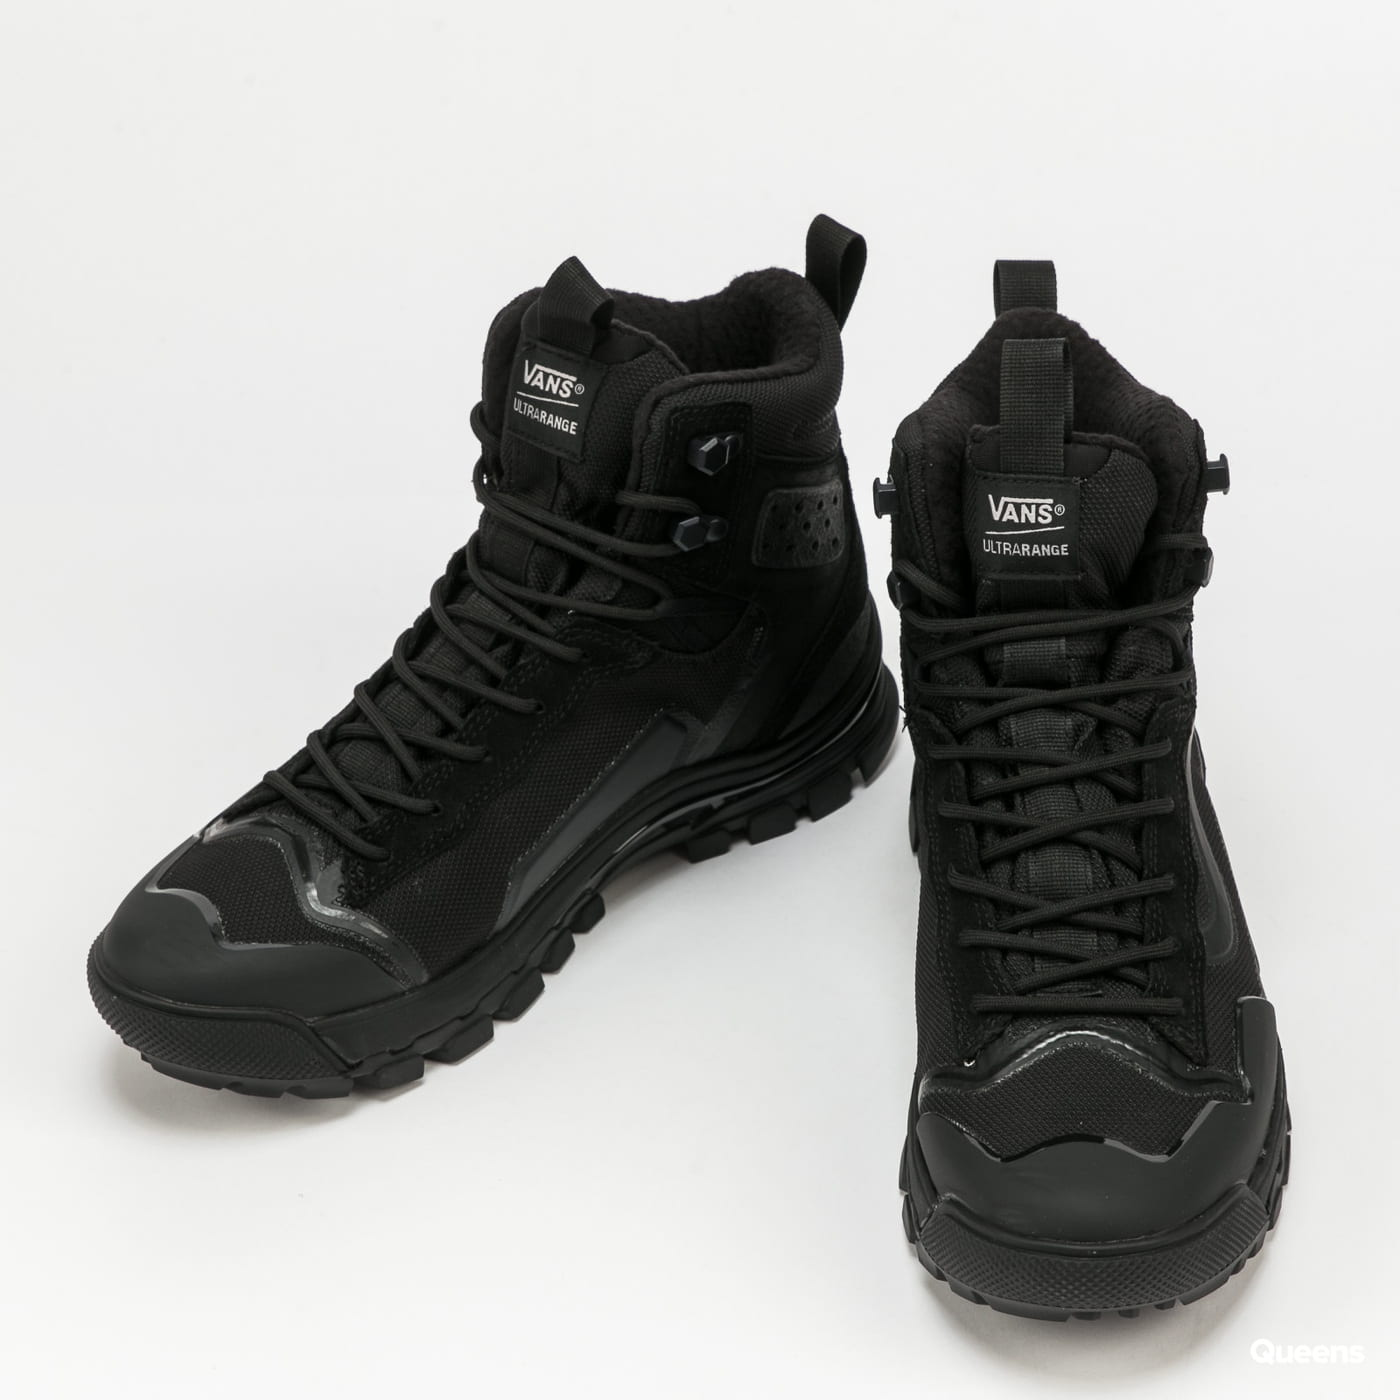 Vans UltraRange Exo Hi Gore-Tex MTE-3 black / black